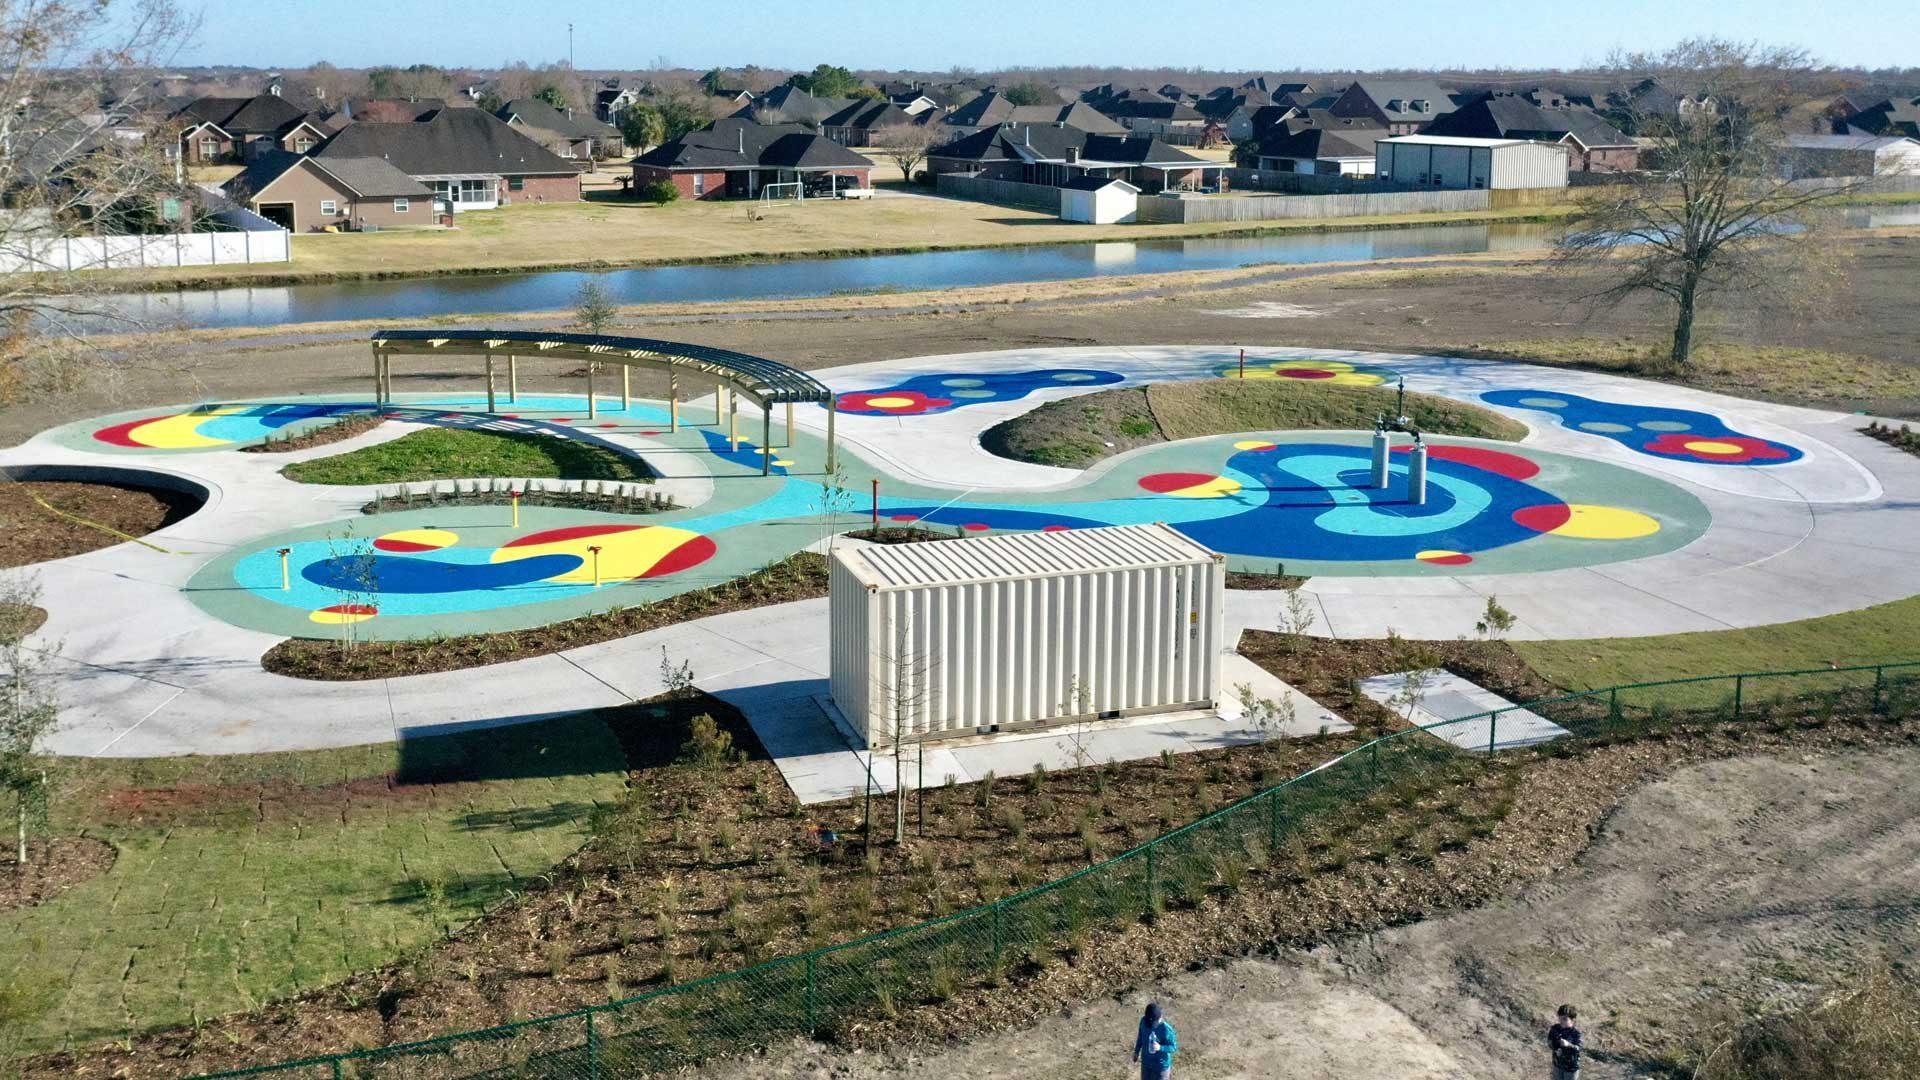 BCSP Splash Park Drone Photo